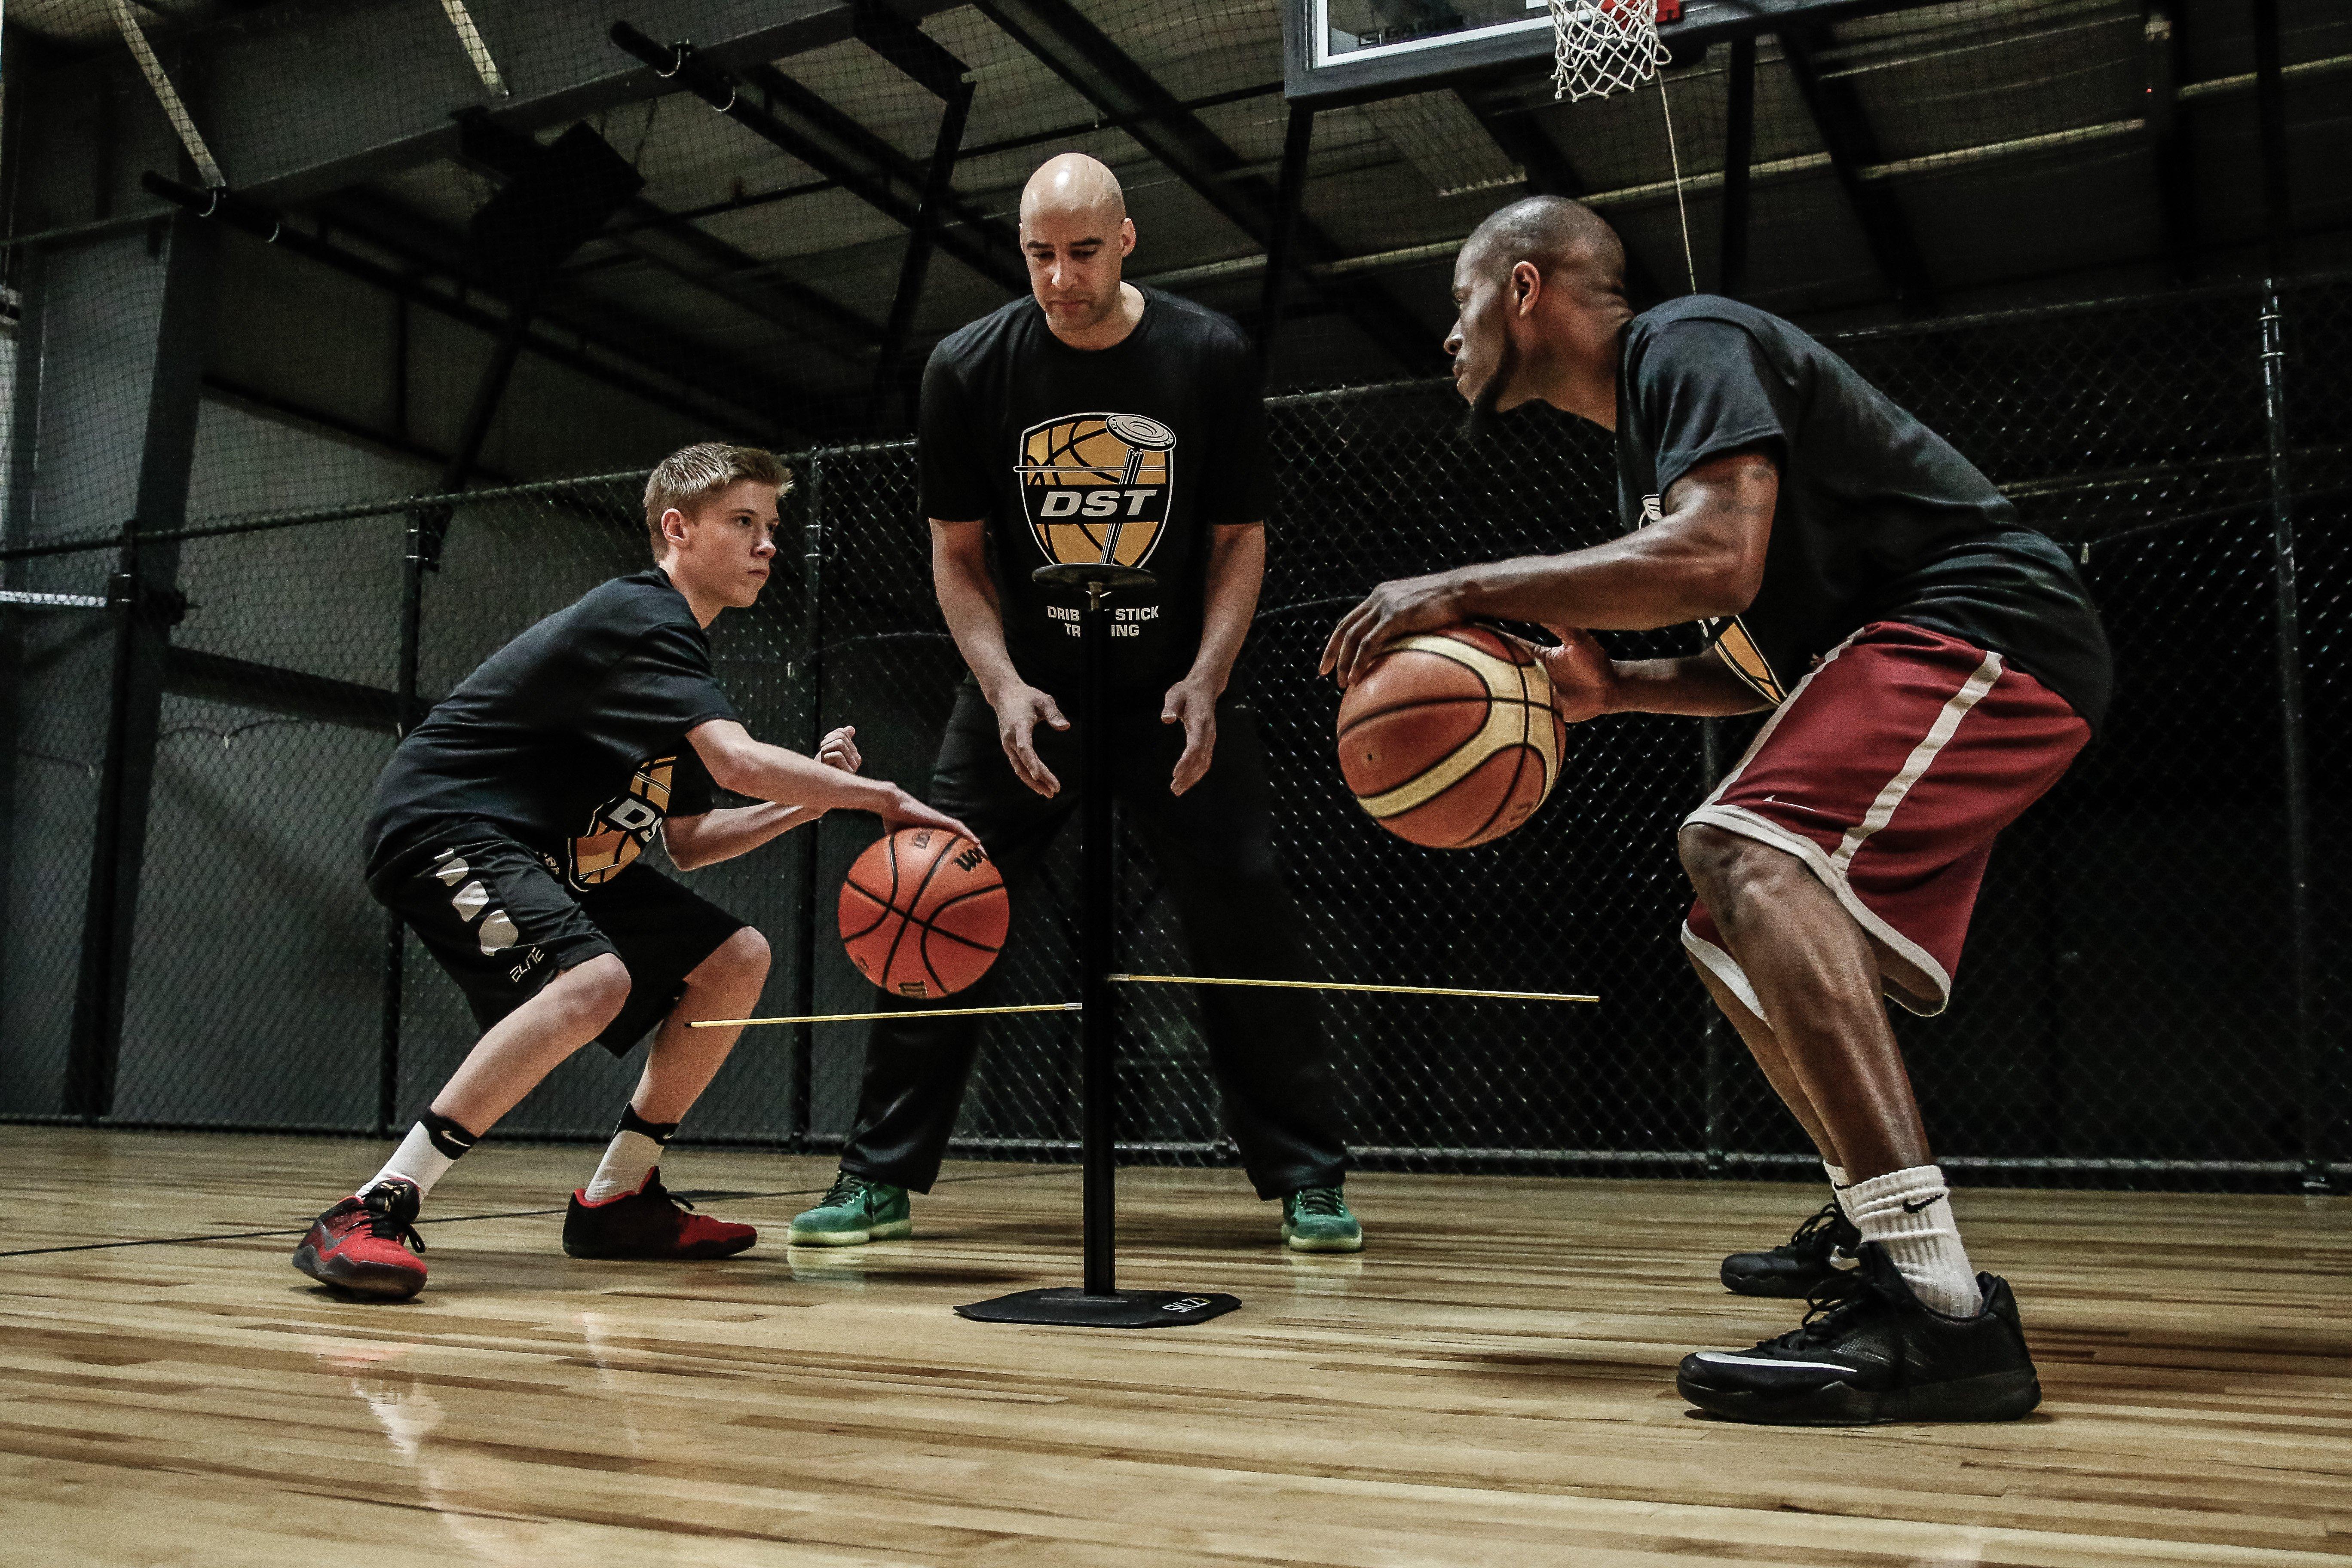 Dribble Stick Basketball Training System